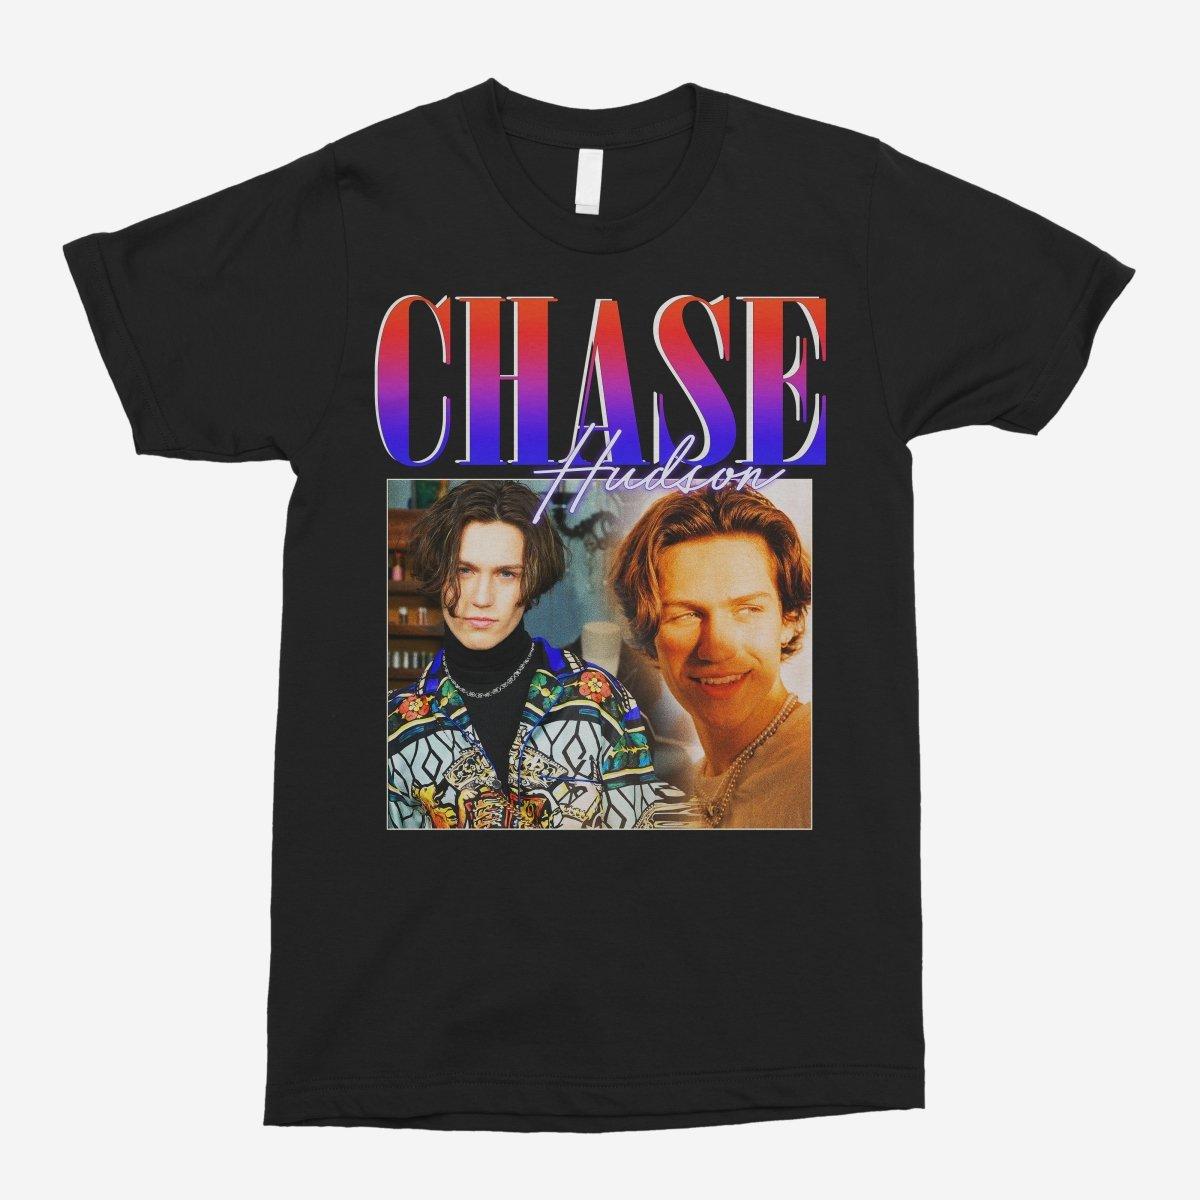 Chase Hudson Vintage Unisex T-Shirt